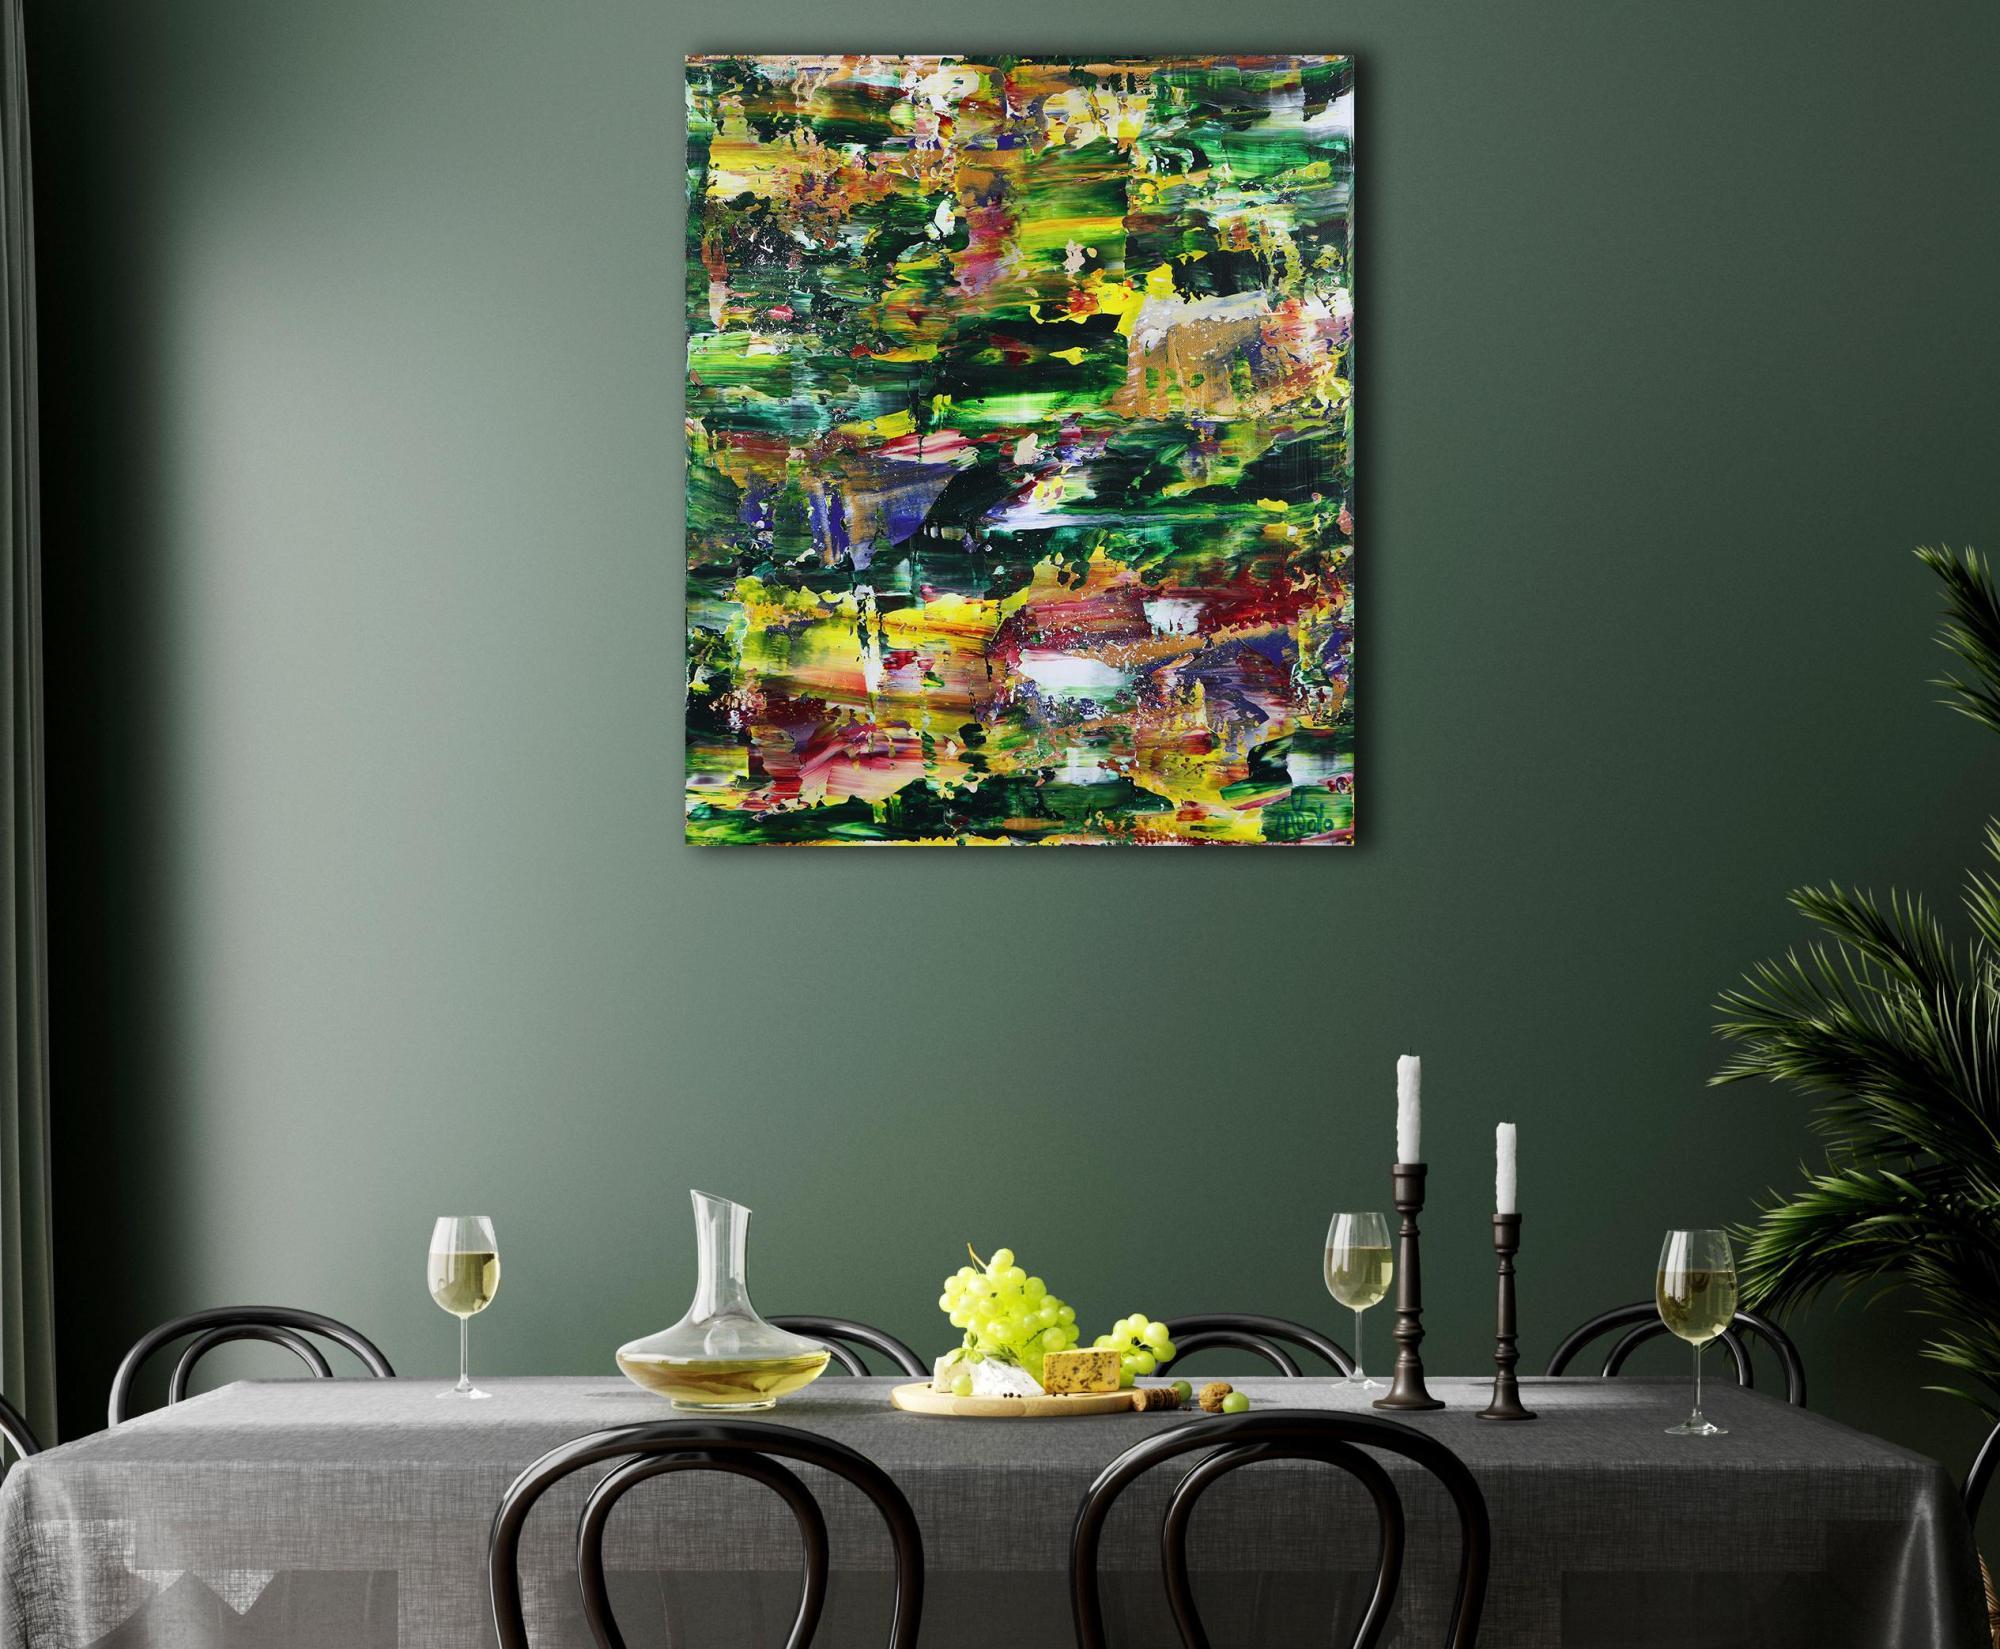 Room example / Moss and Rust 2 (2021) 20x24 in / Artist: Nestor Toro